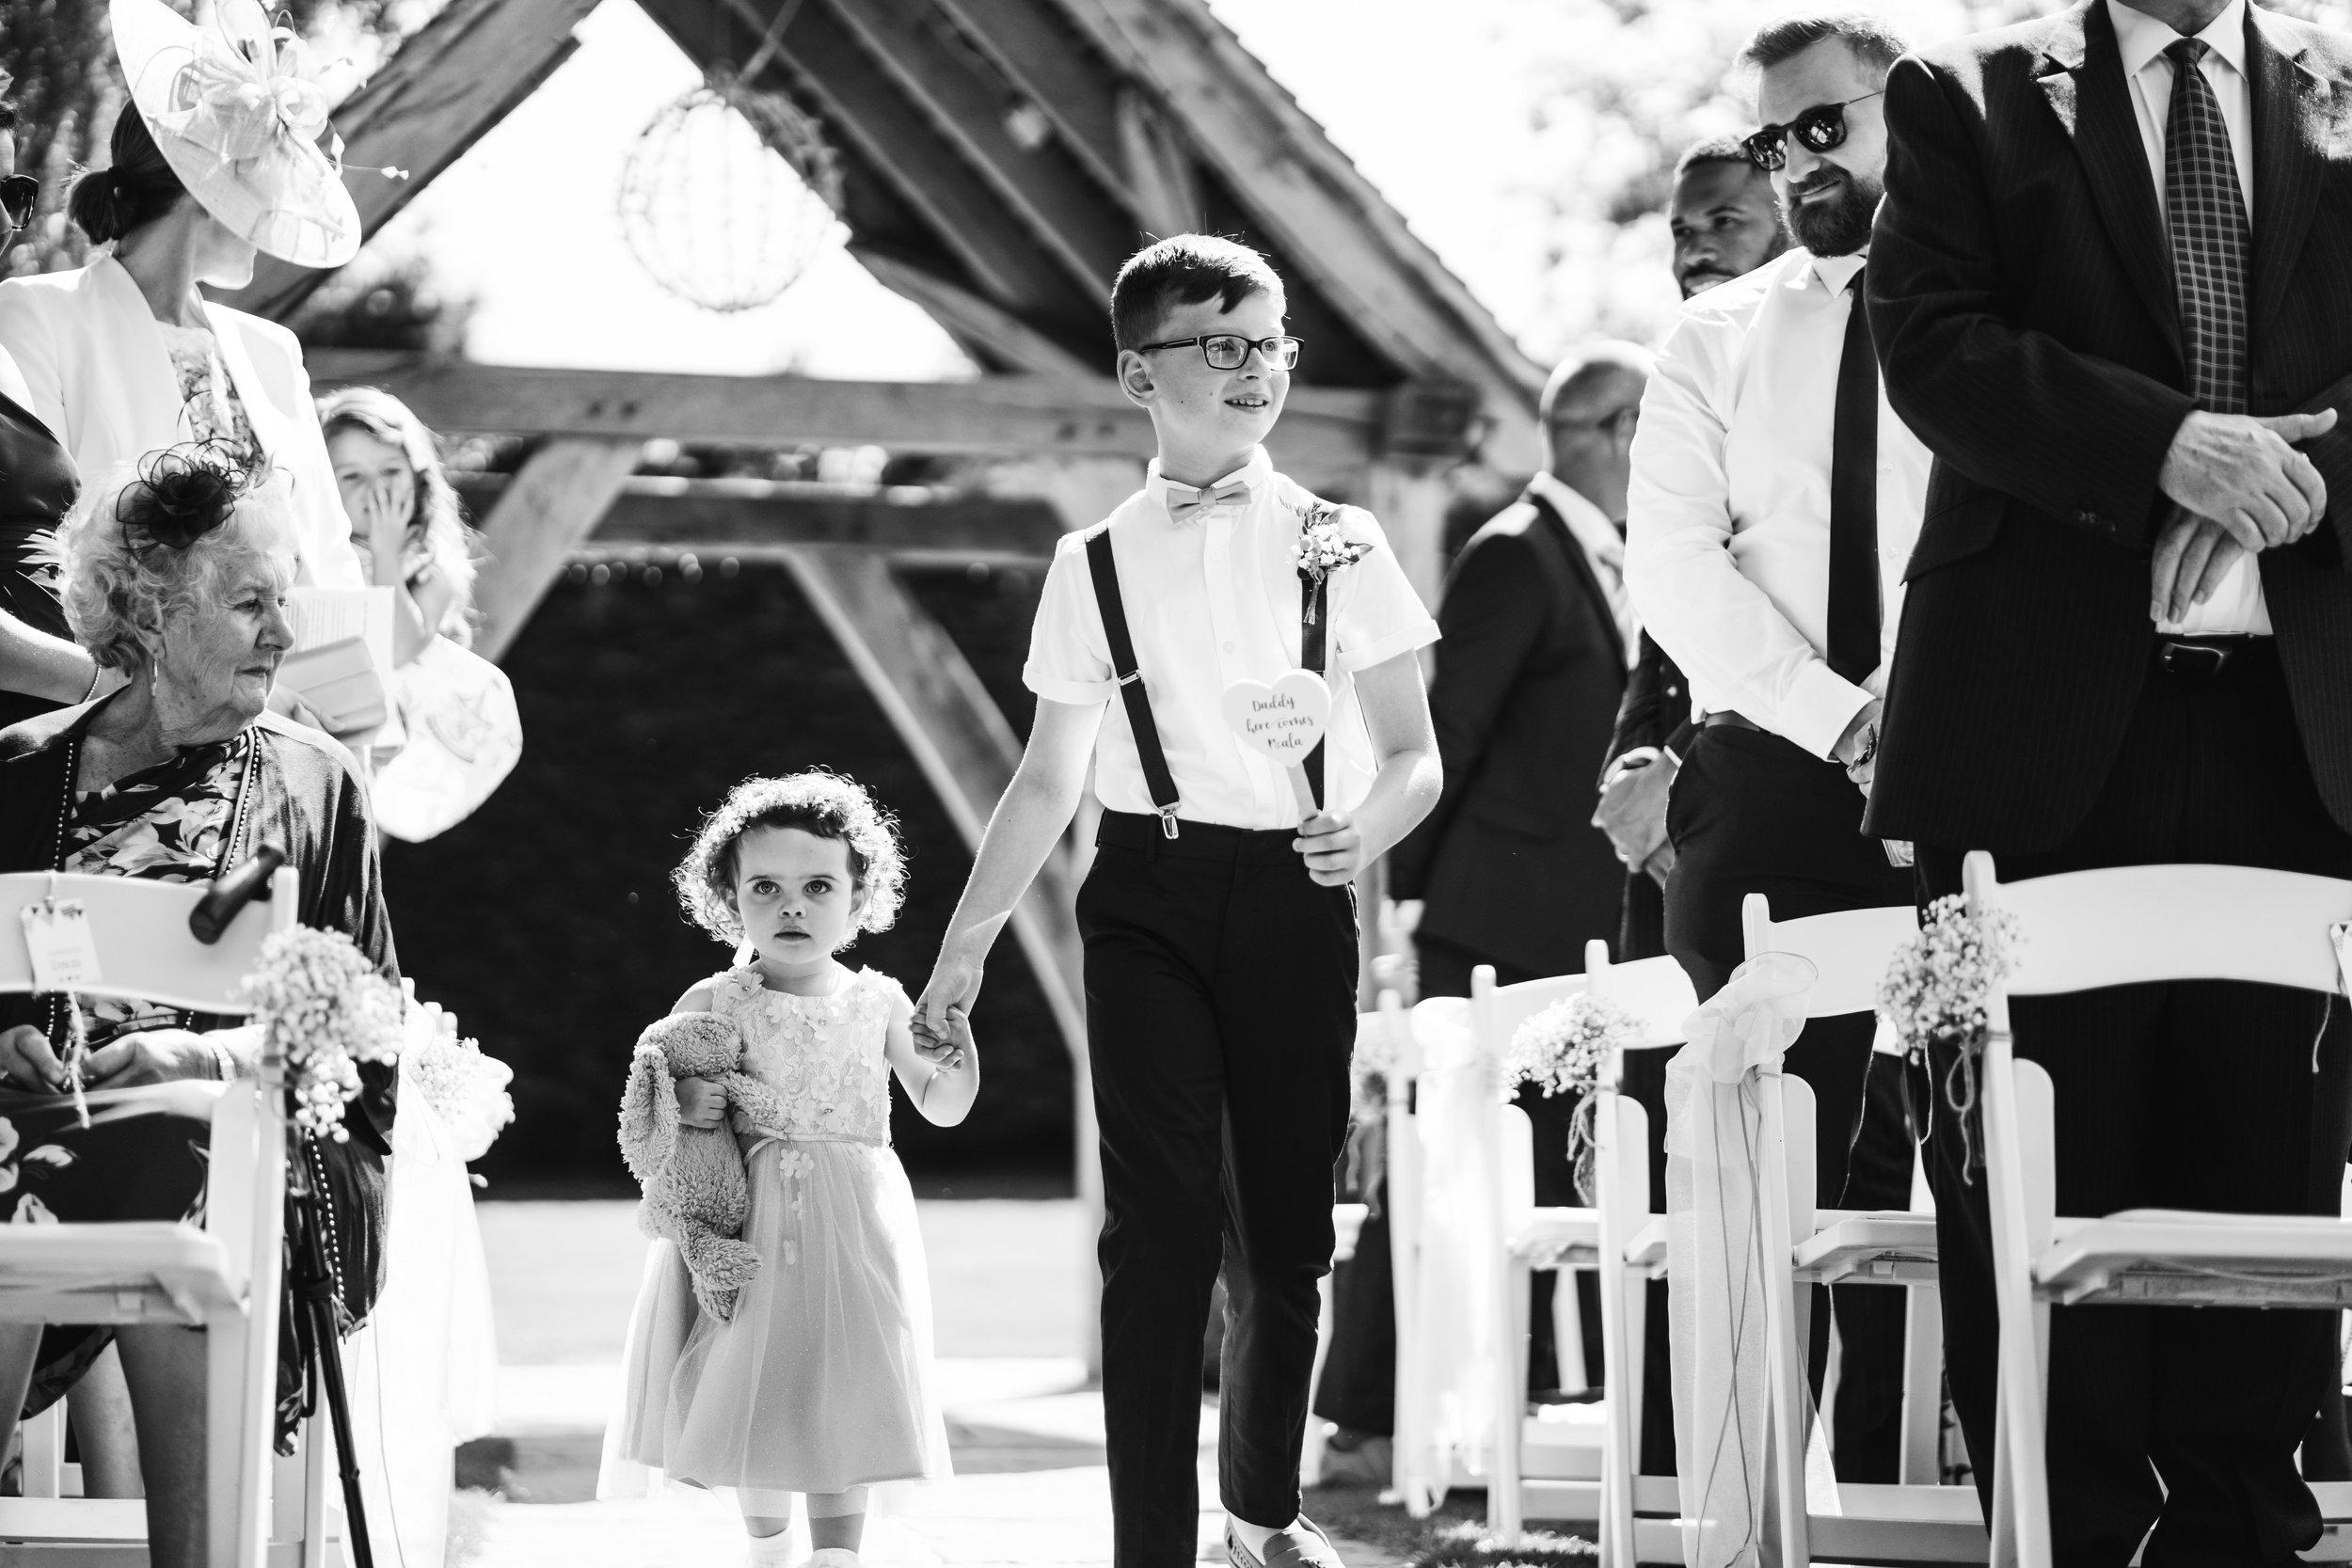 kent-wedding-photographer-01177.jpg